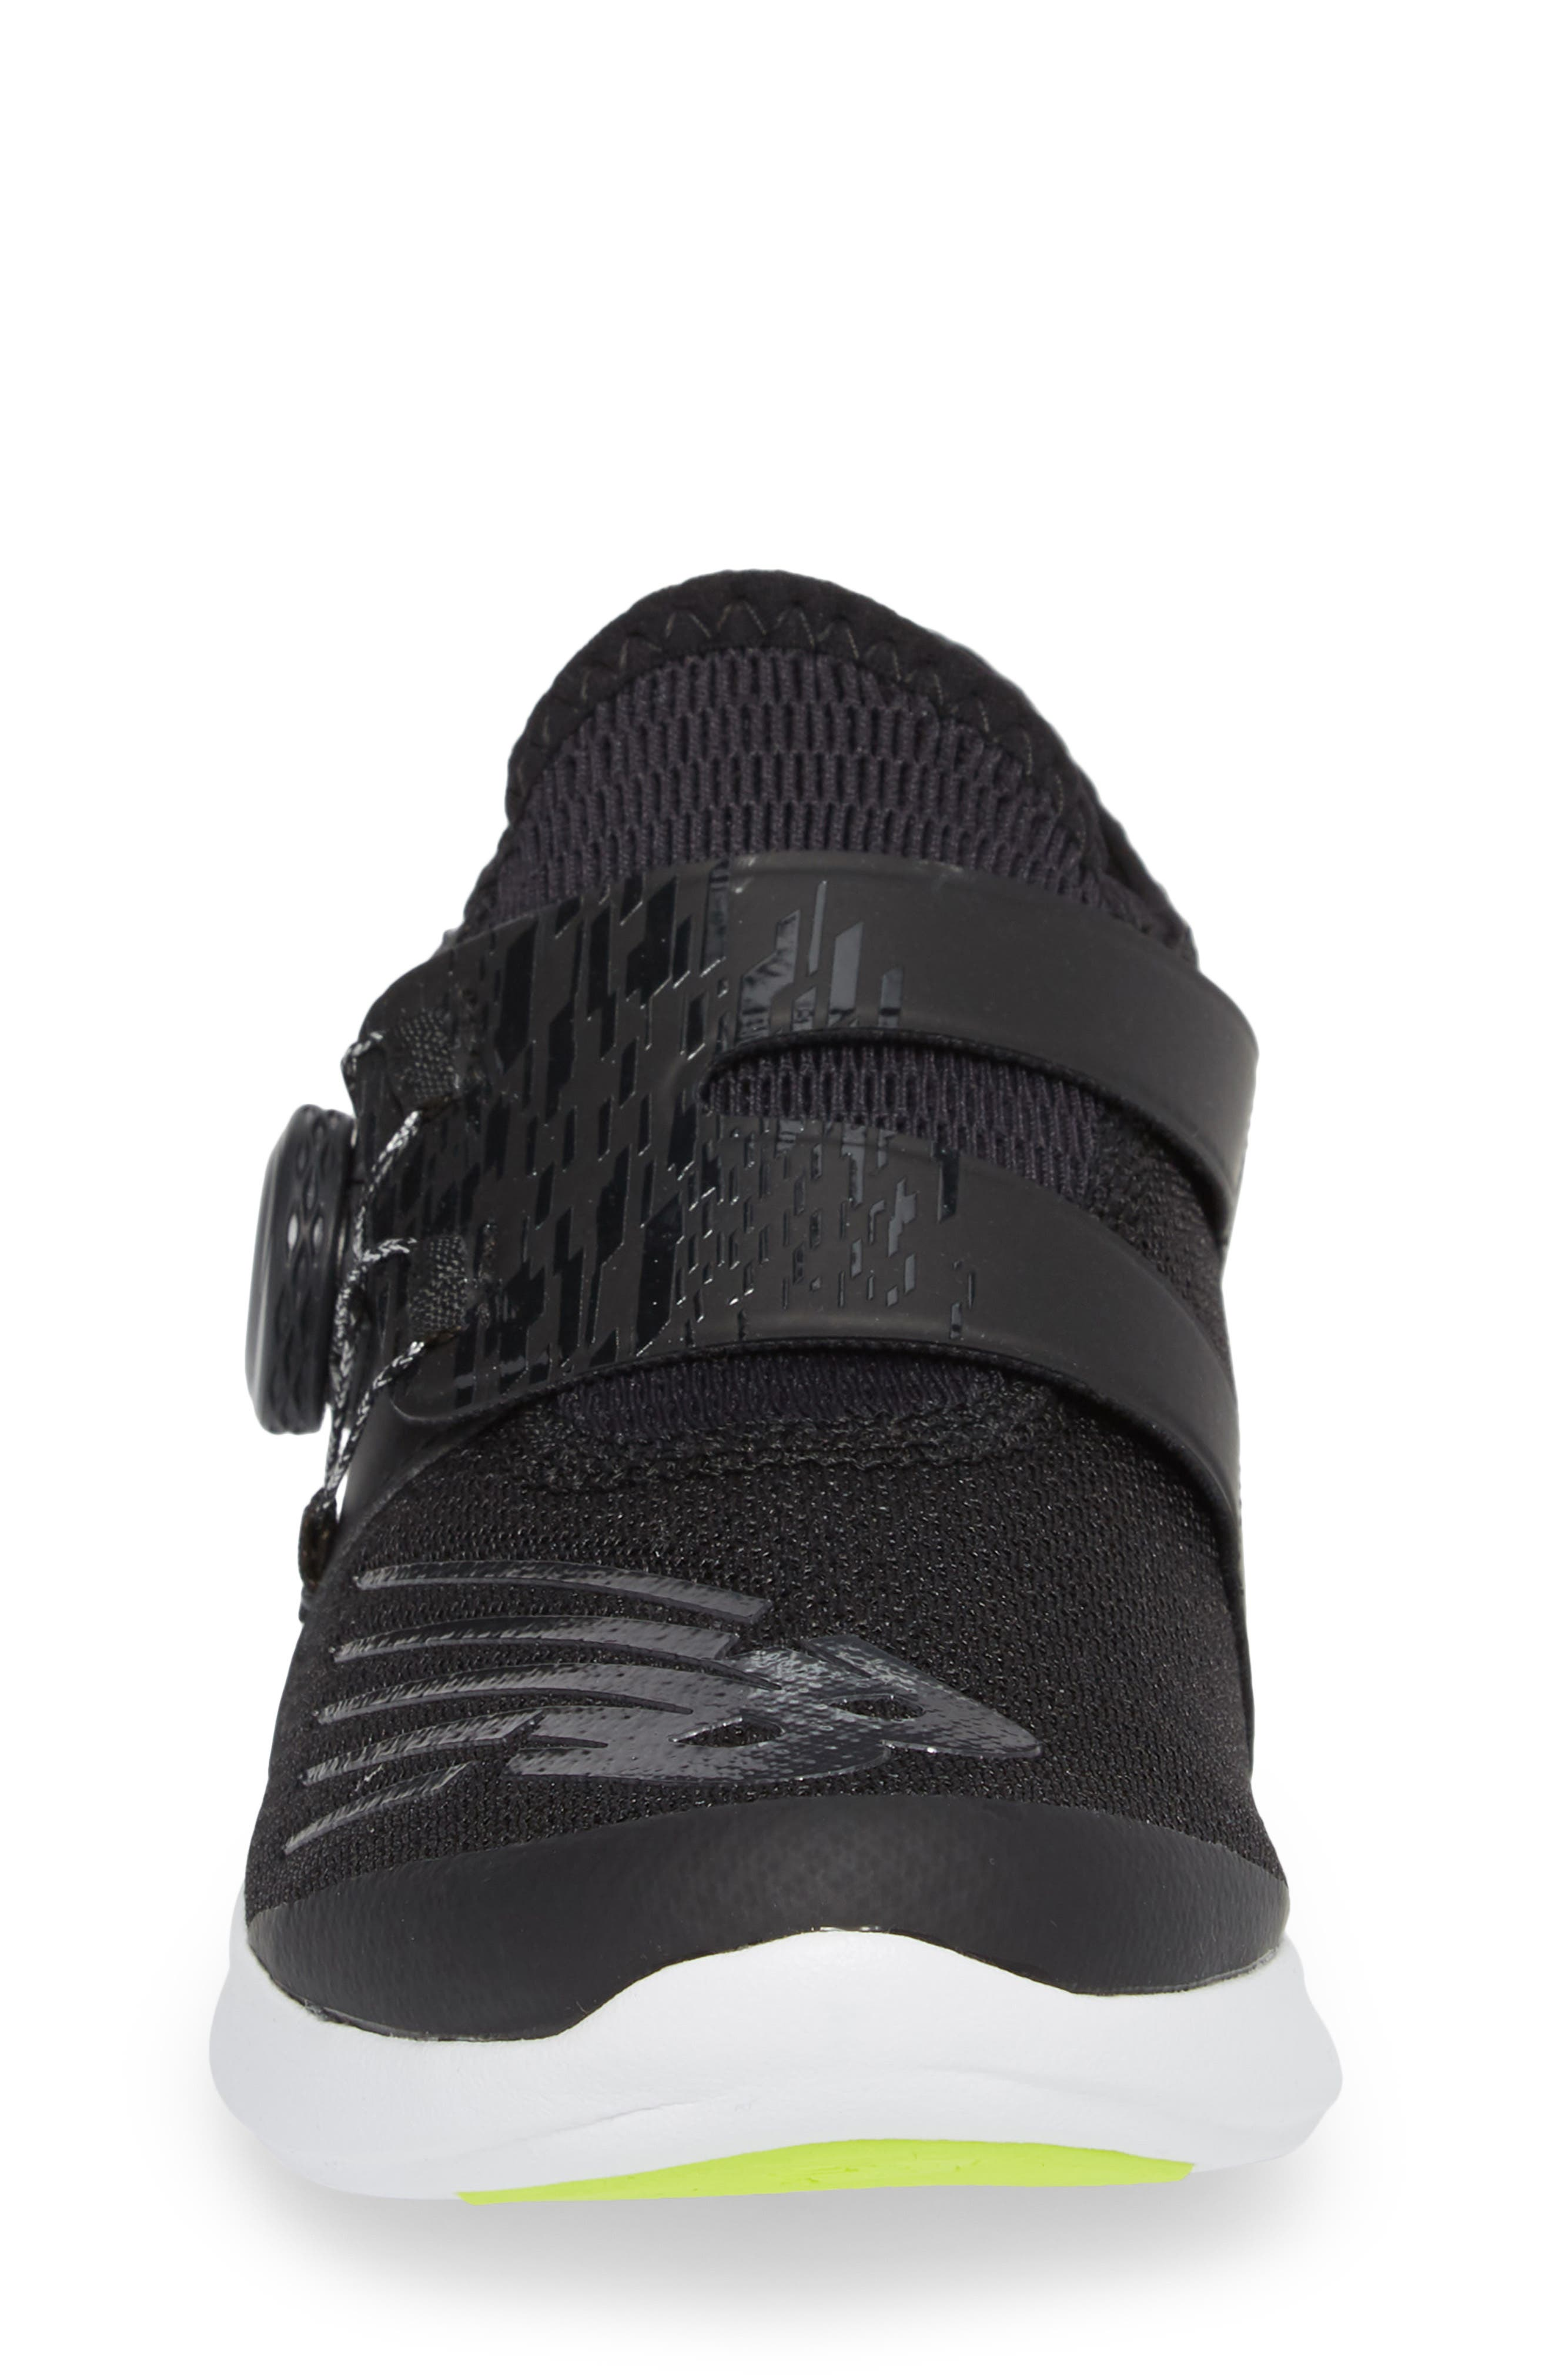 BKO Running Shoe,                             Alternate thumbnail 4, color,                             Black/ Hi Lite